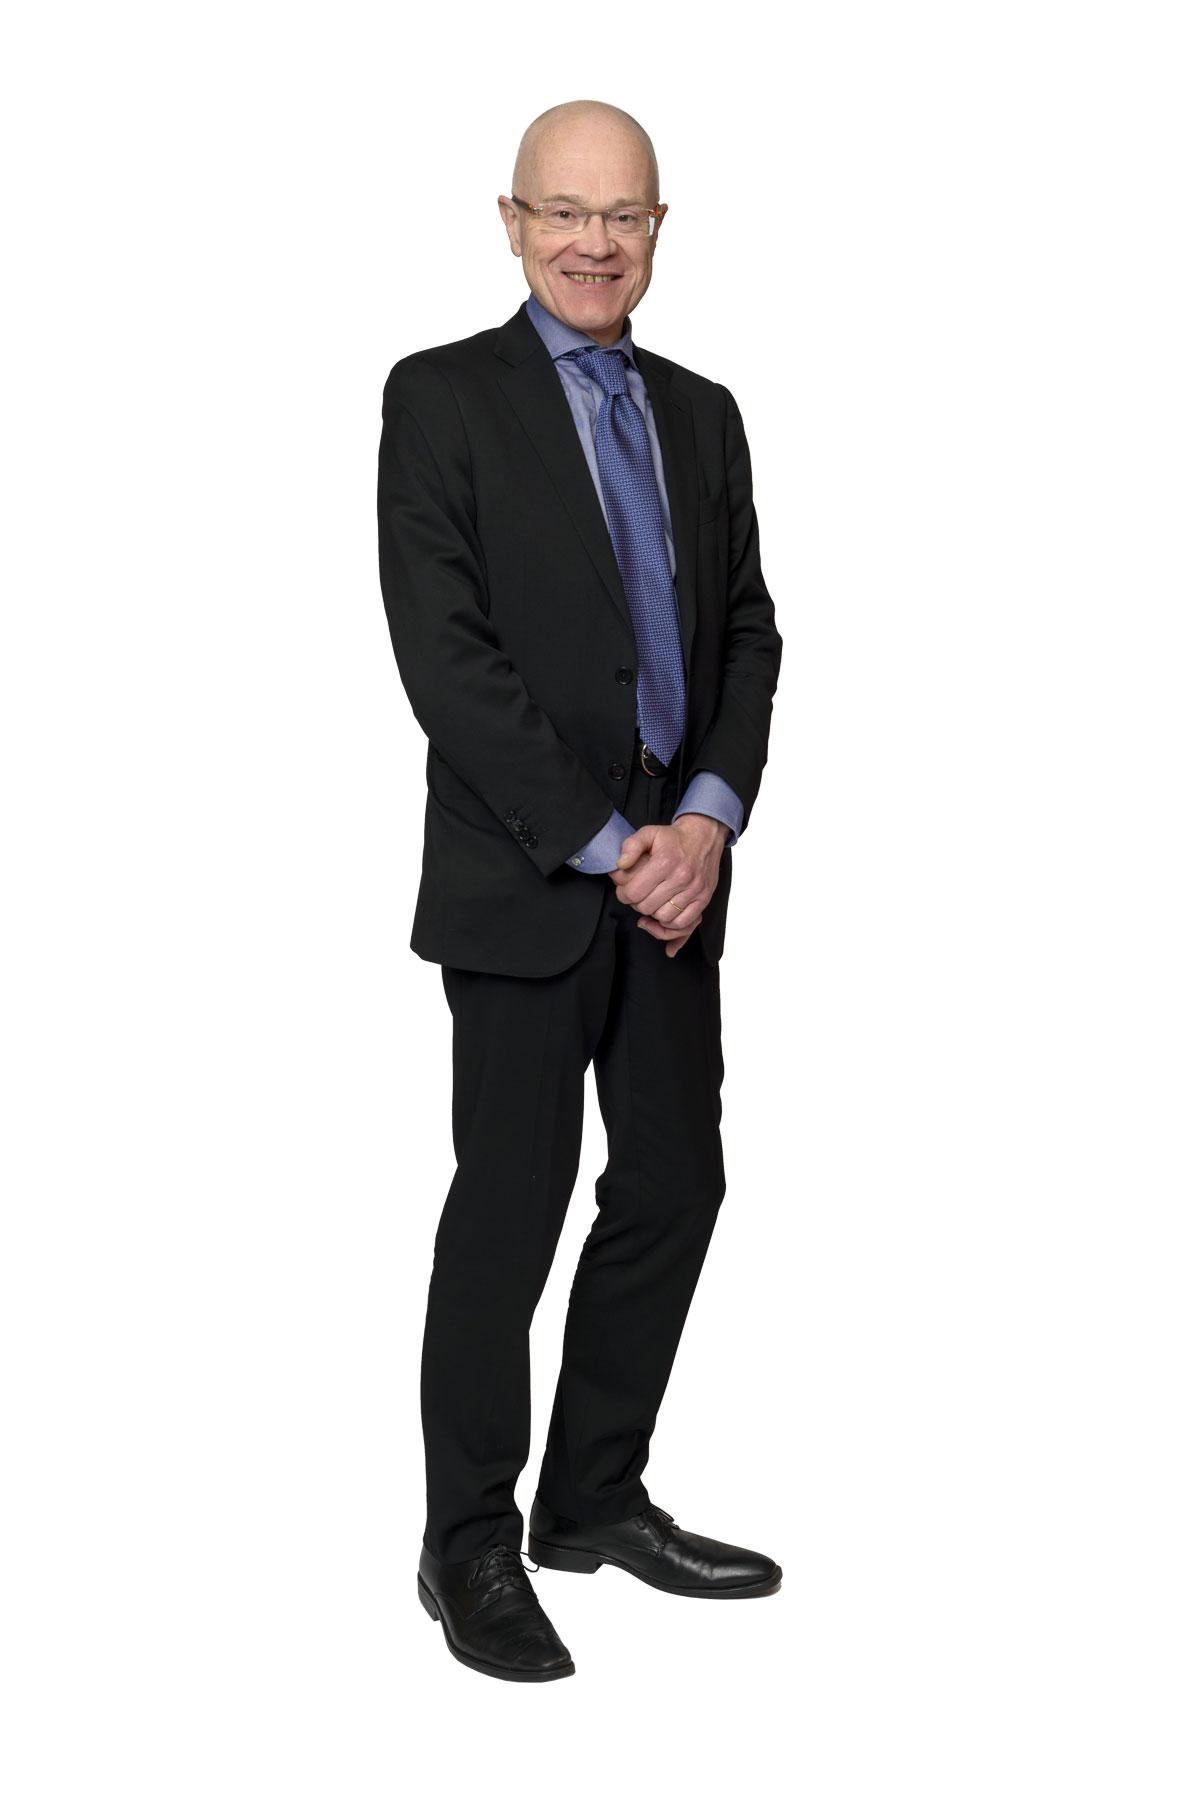 Hervé Deprez